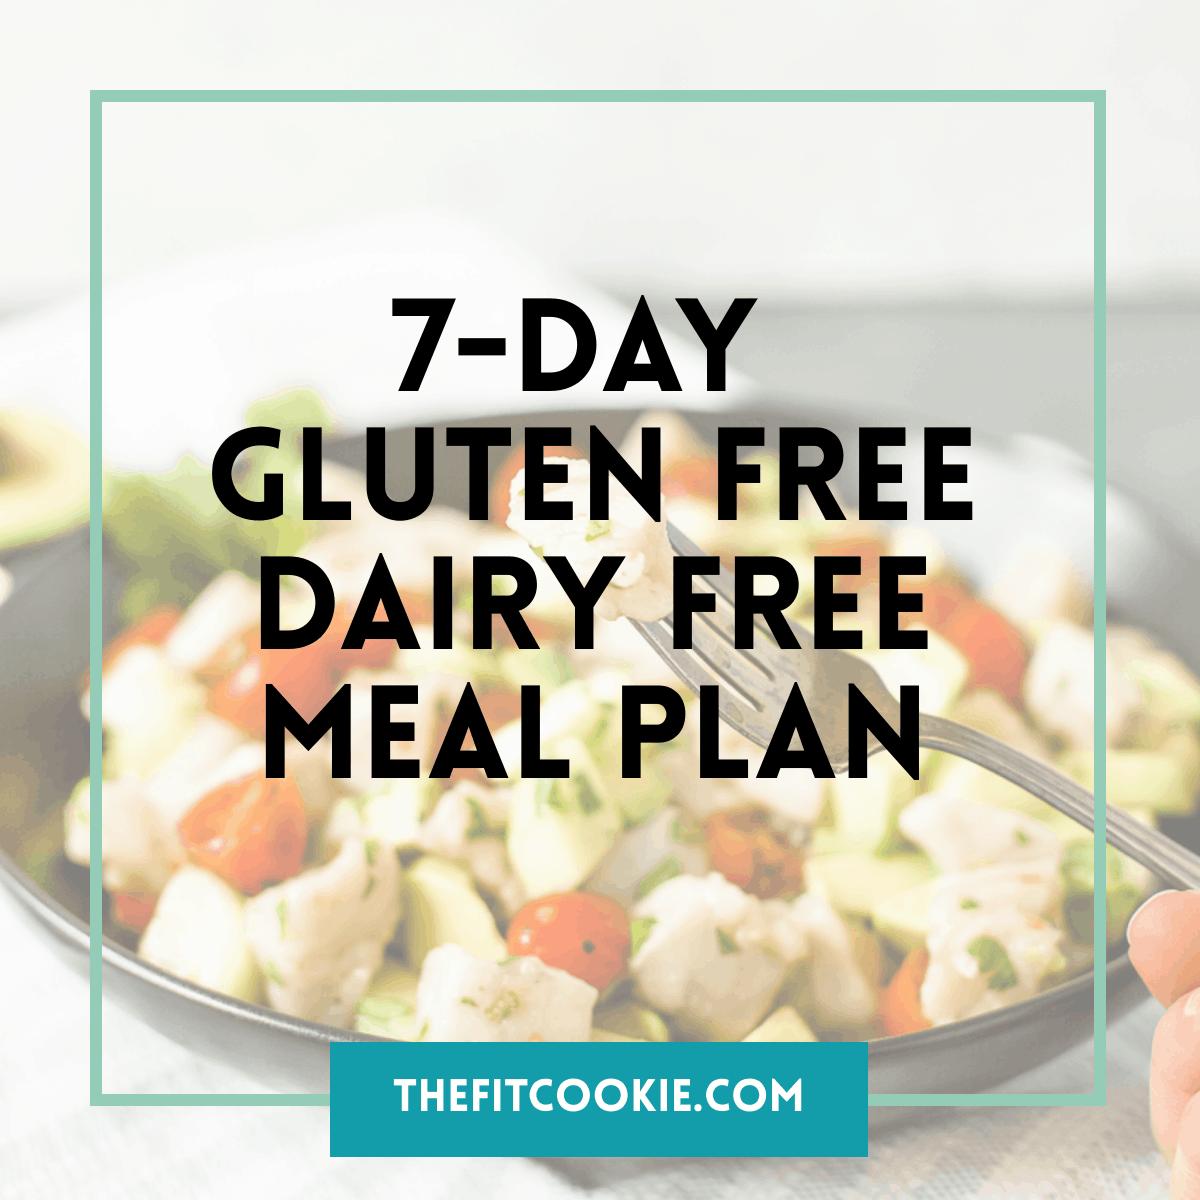 7-Day Gluten Free Dairy Free Meal Plan